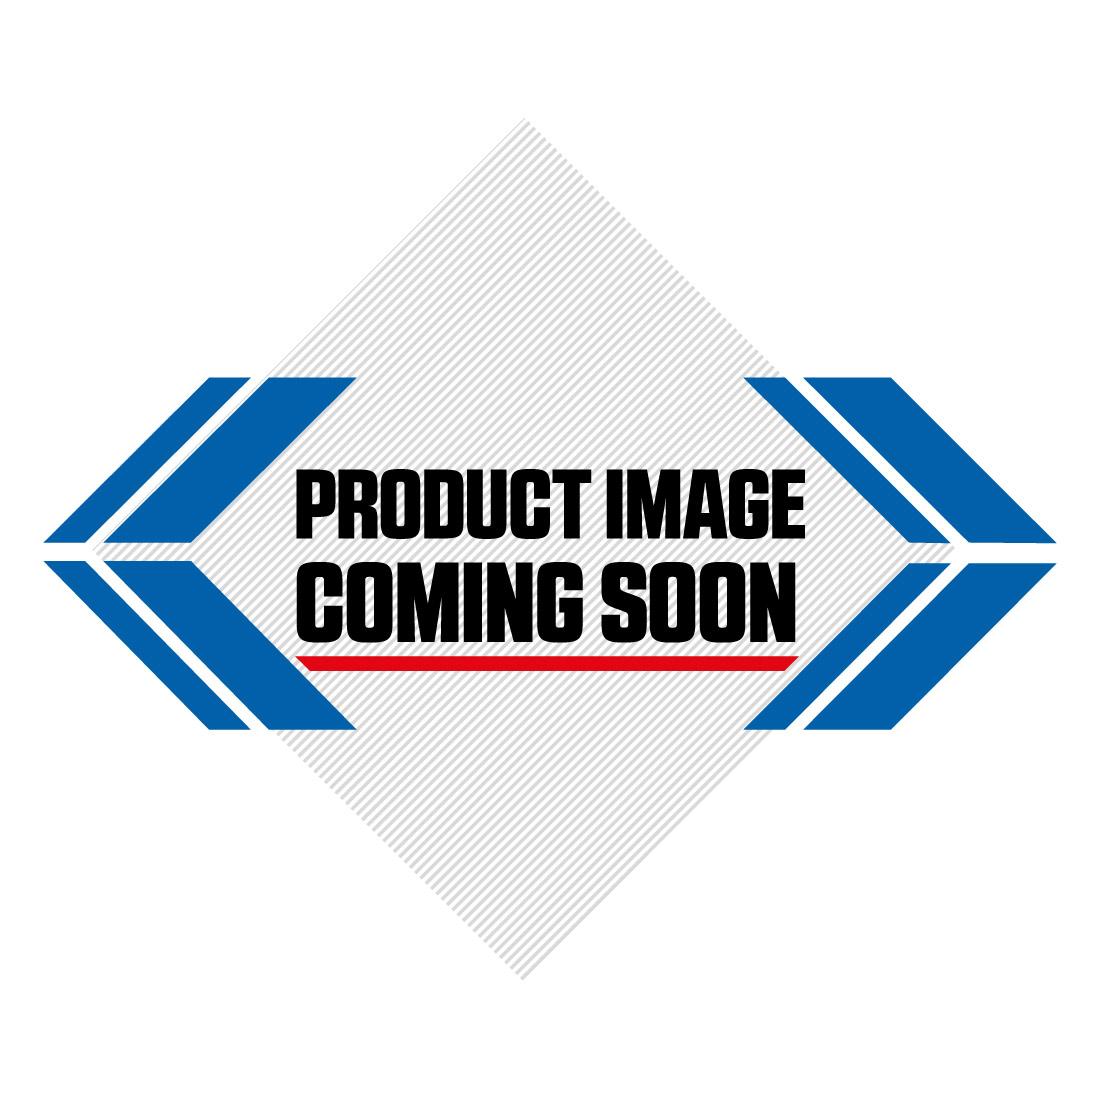 Renthal Twinring Rear Sprocket KTM SX SX-F EXC EXC-F Husqvarna TC FC TE FE - Orange Image-1